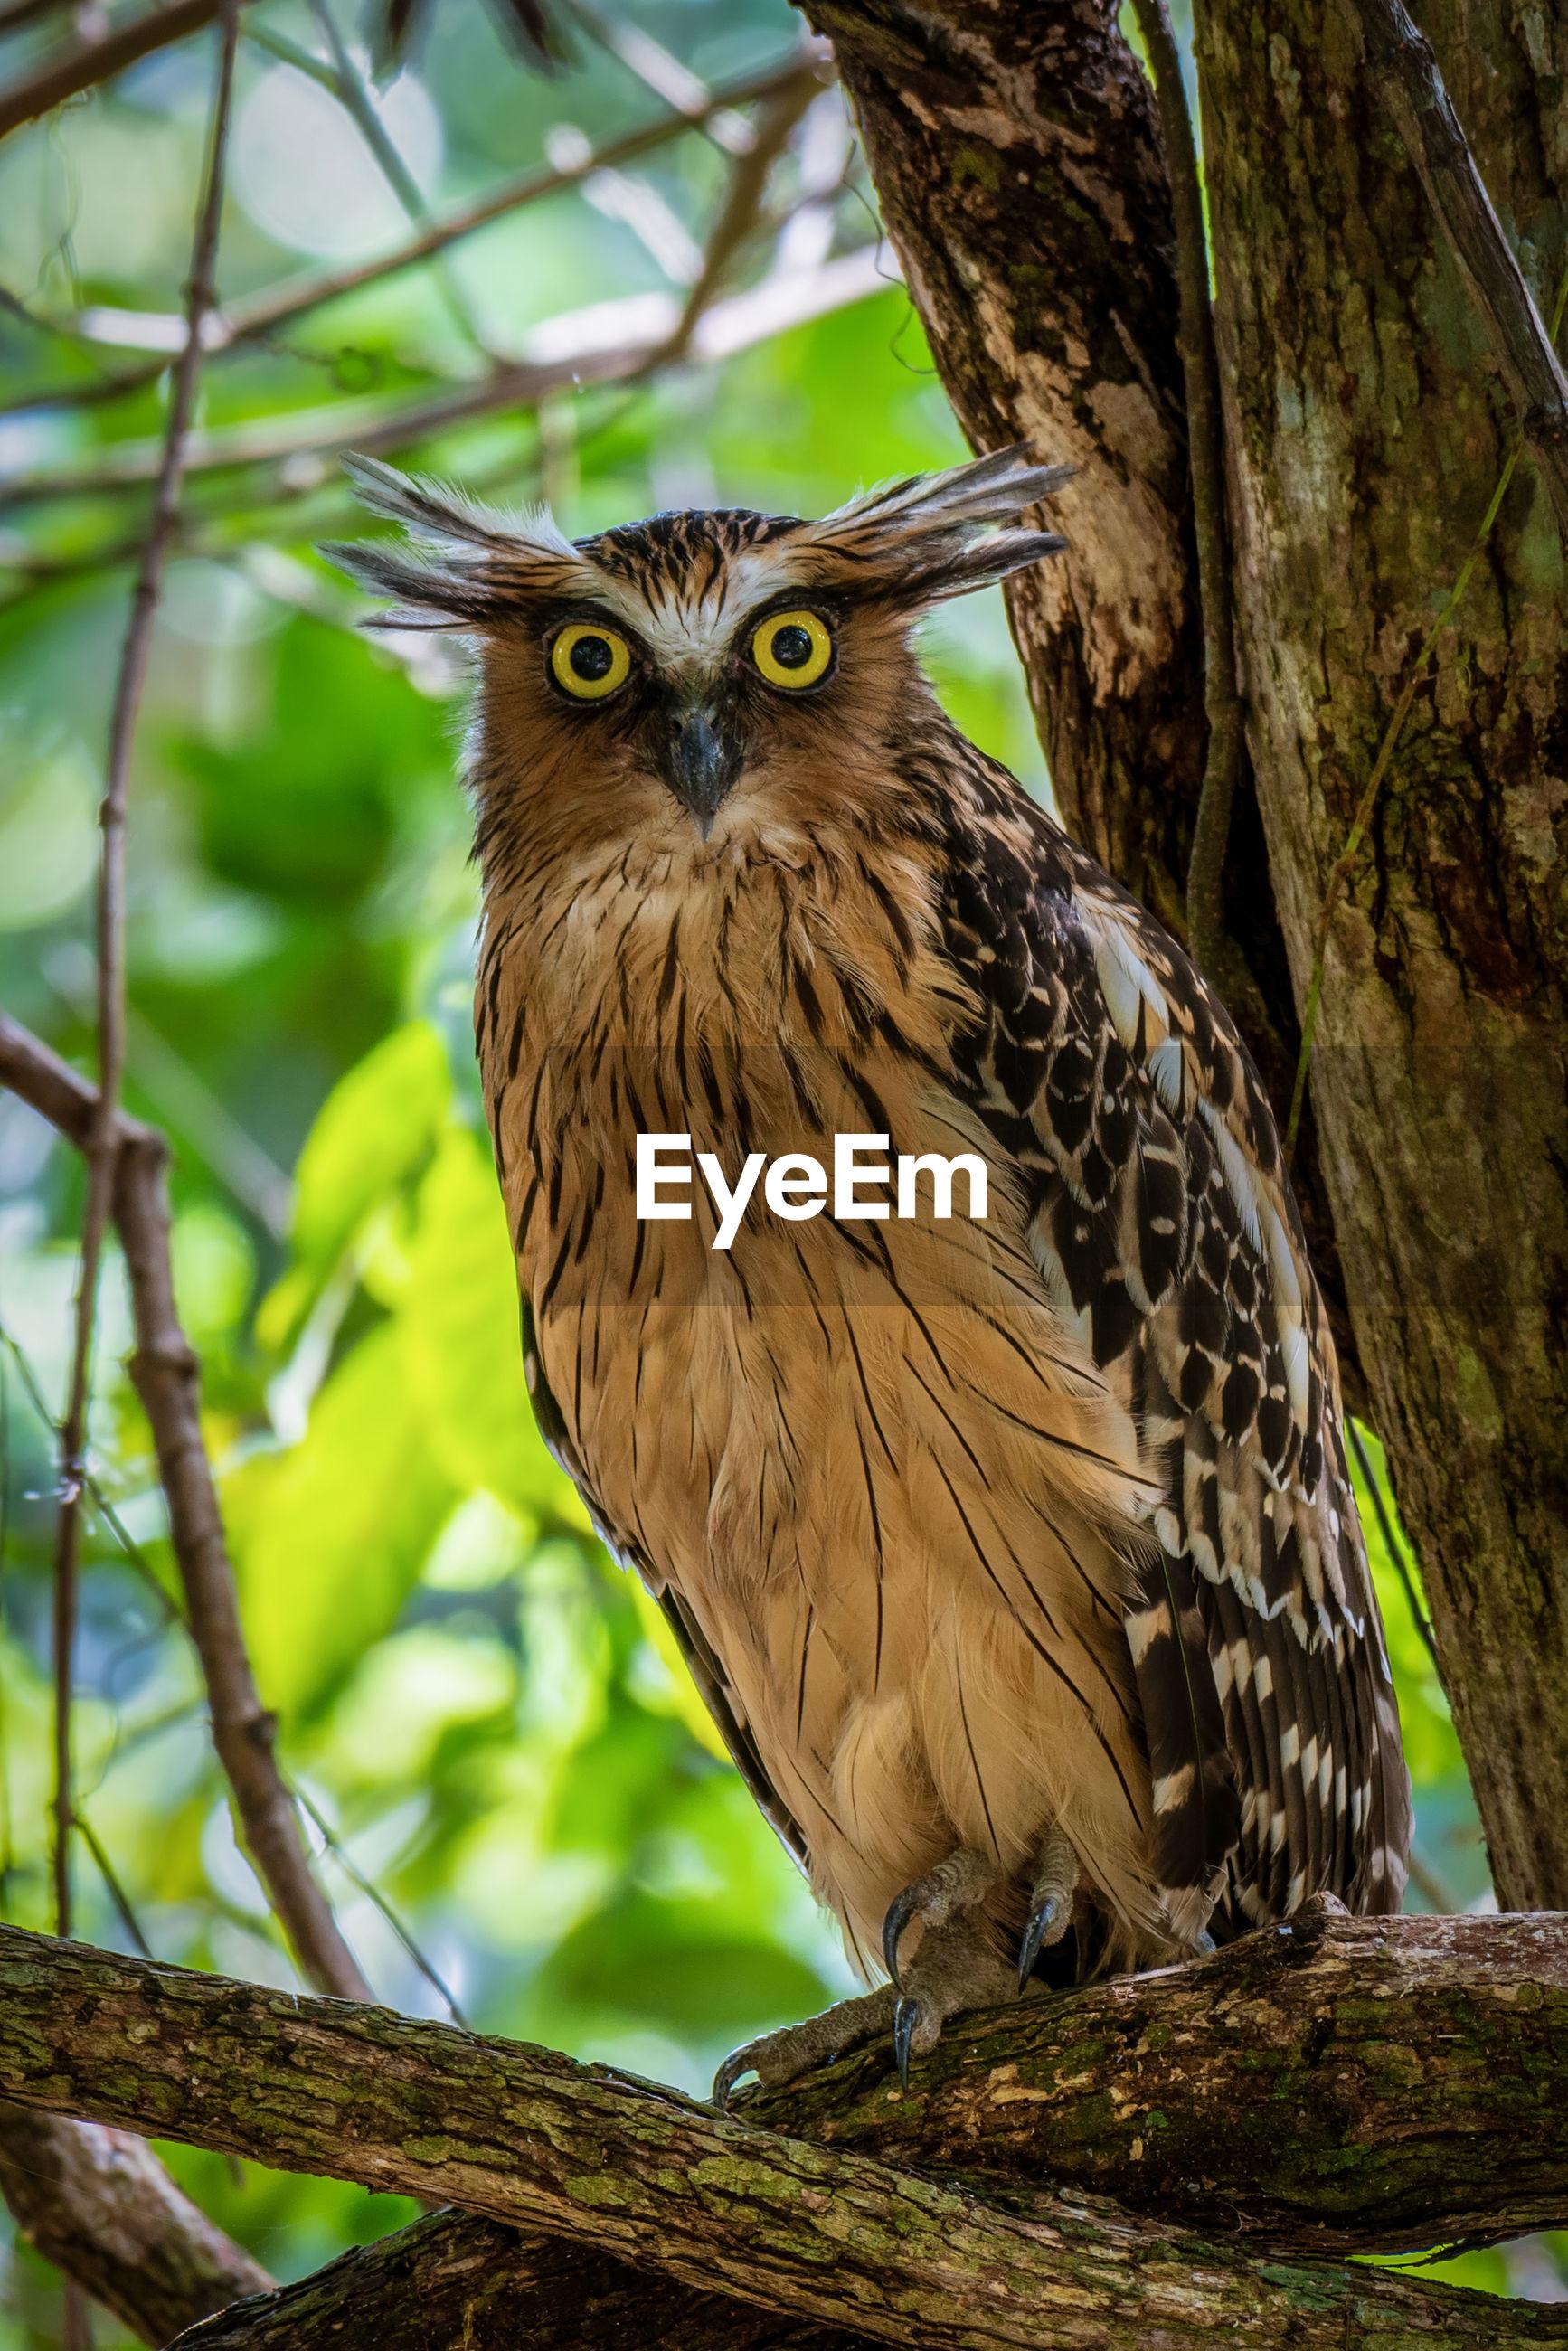 Portrait of buffy fish owl perching on tree